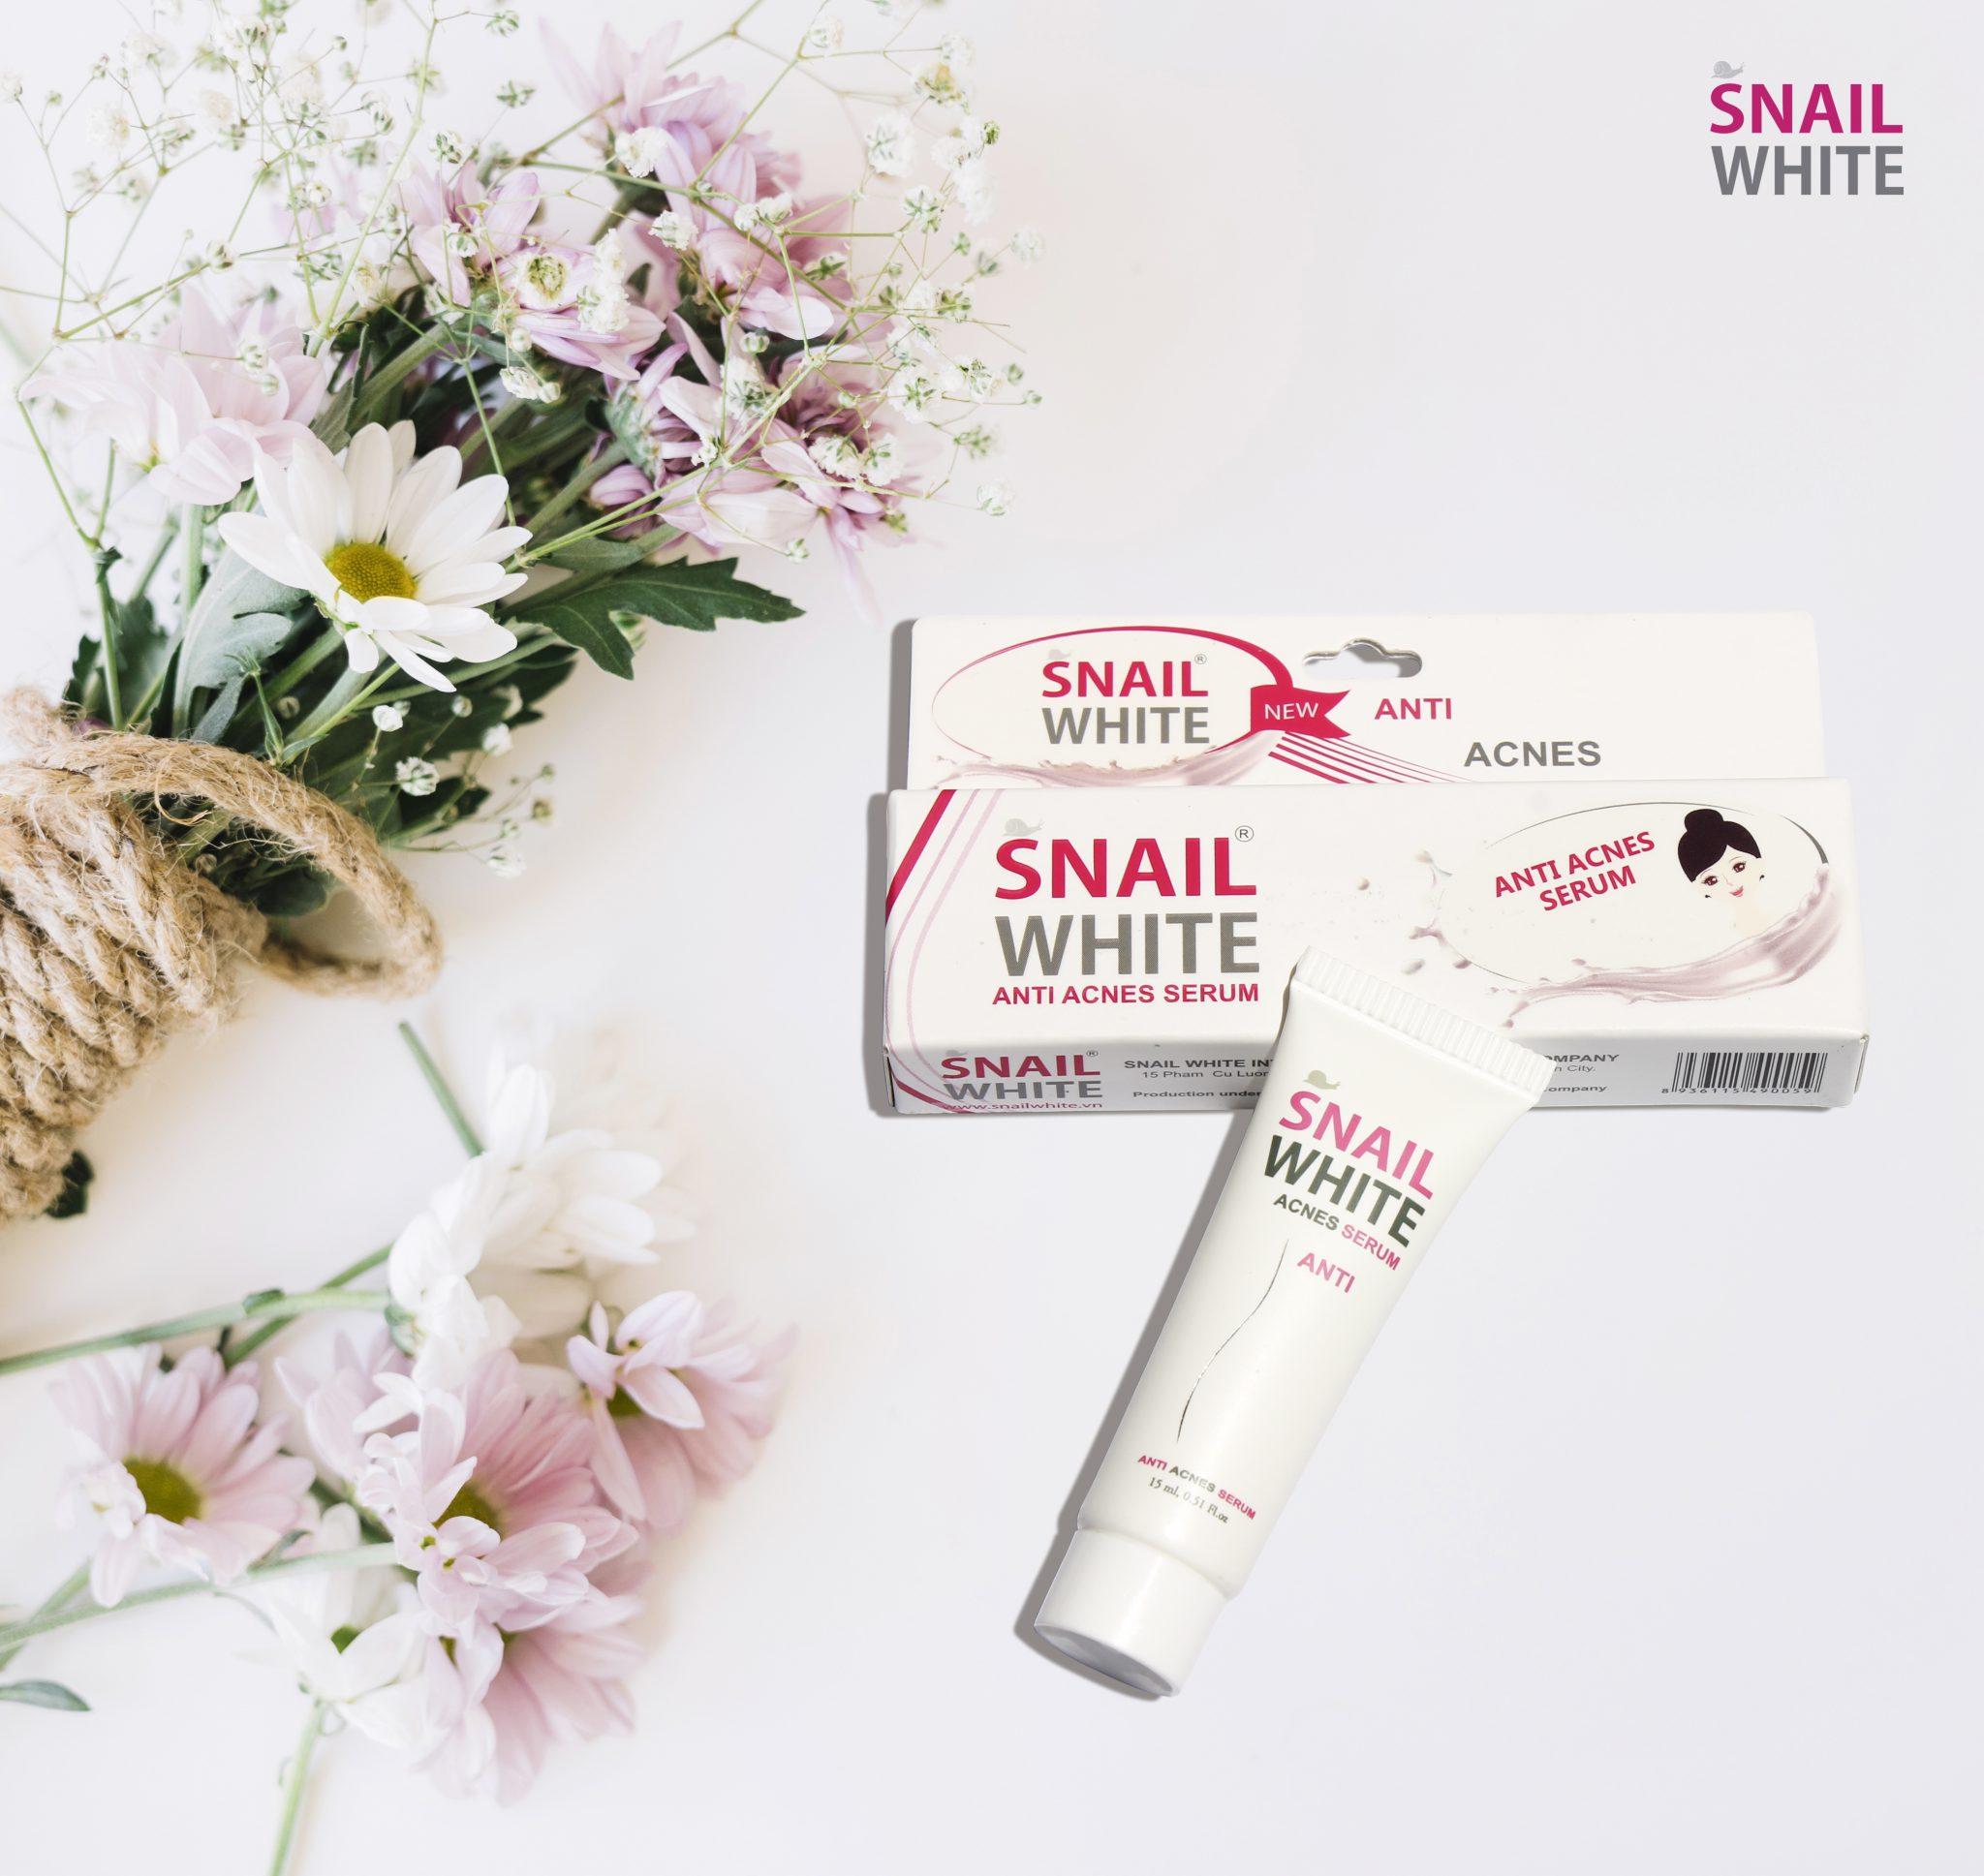 Sạch mụn siêu tốc 24h - SNAIL WHITE Anti Acnes Serum - 8936115490050